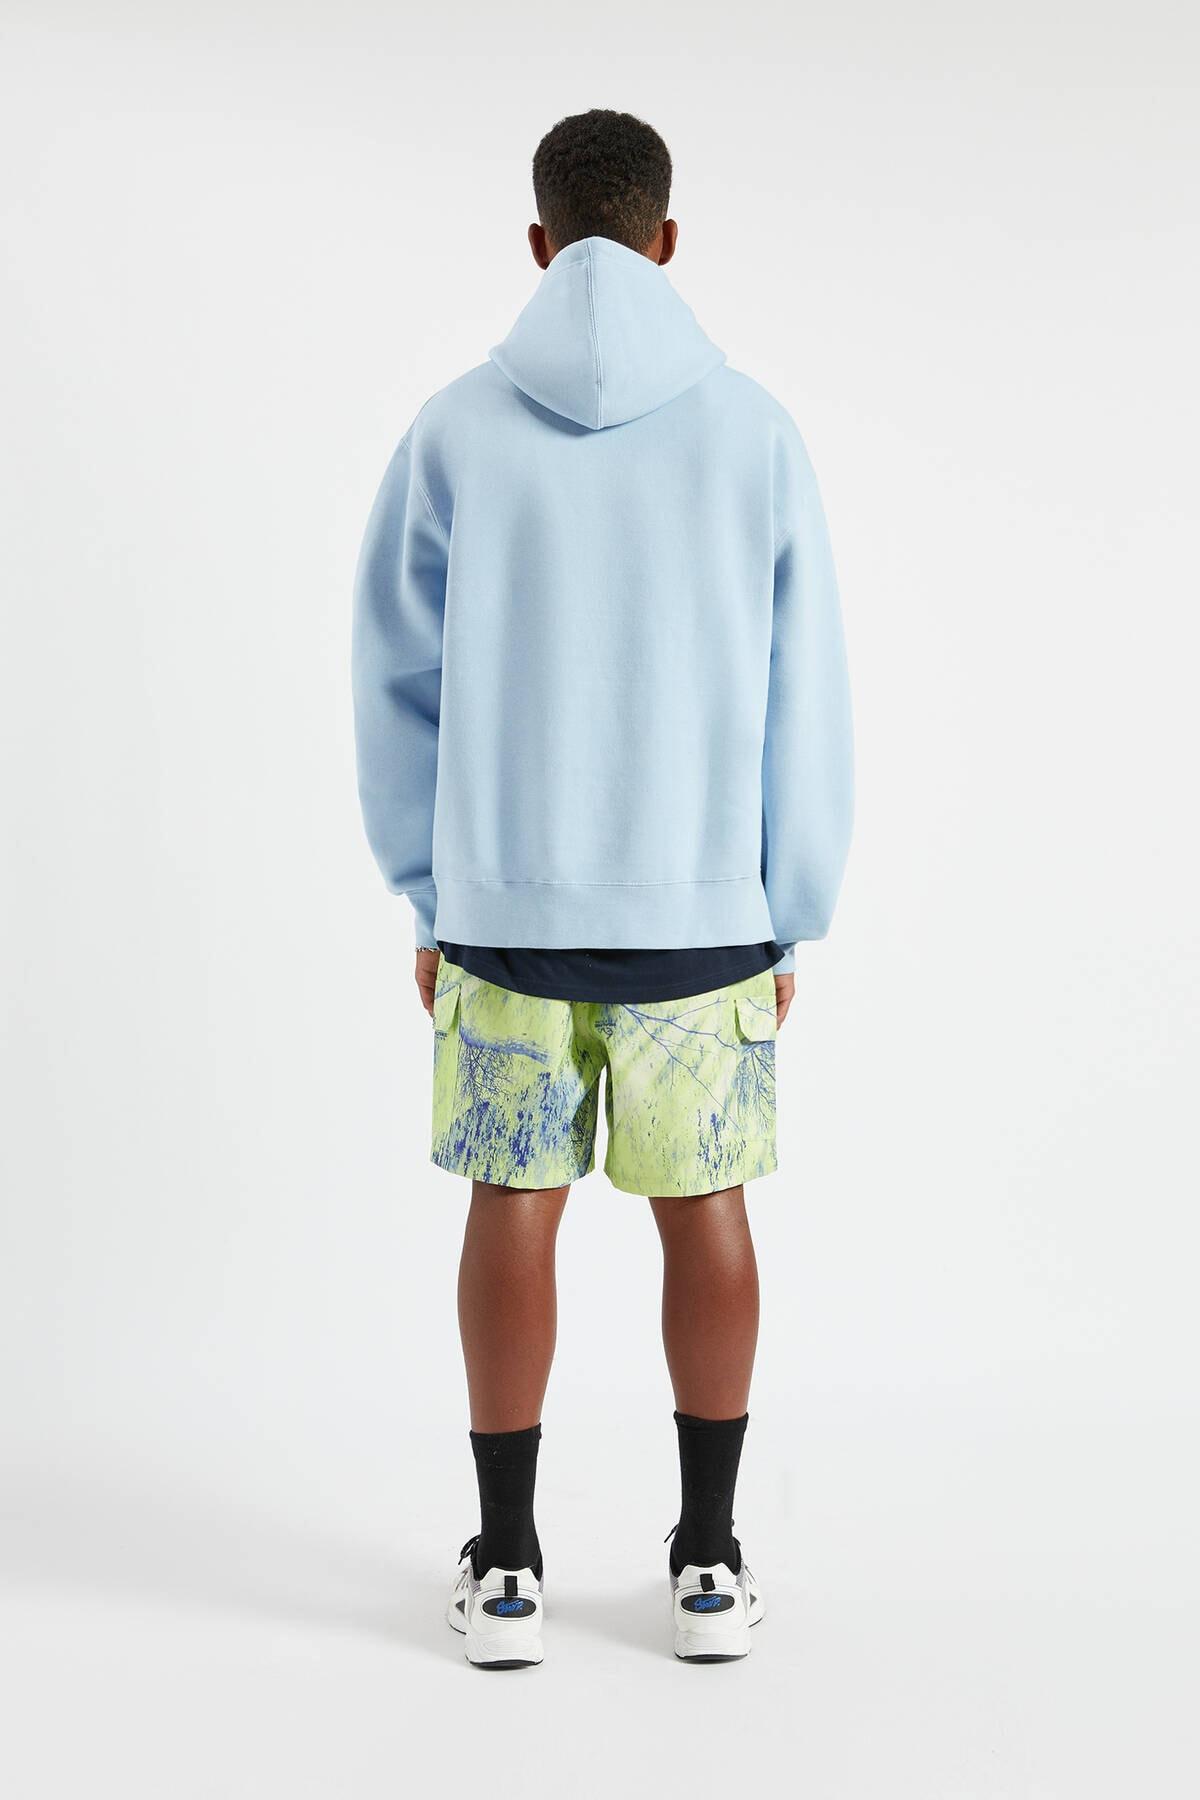 Pull & Bear Erkek Gök Mavisi Kapüşonlu Kanguru Cepli Basic Sweatshirt 09594513 2